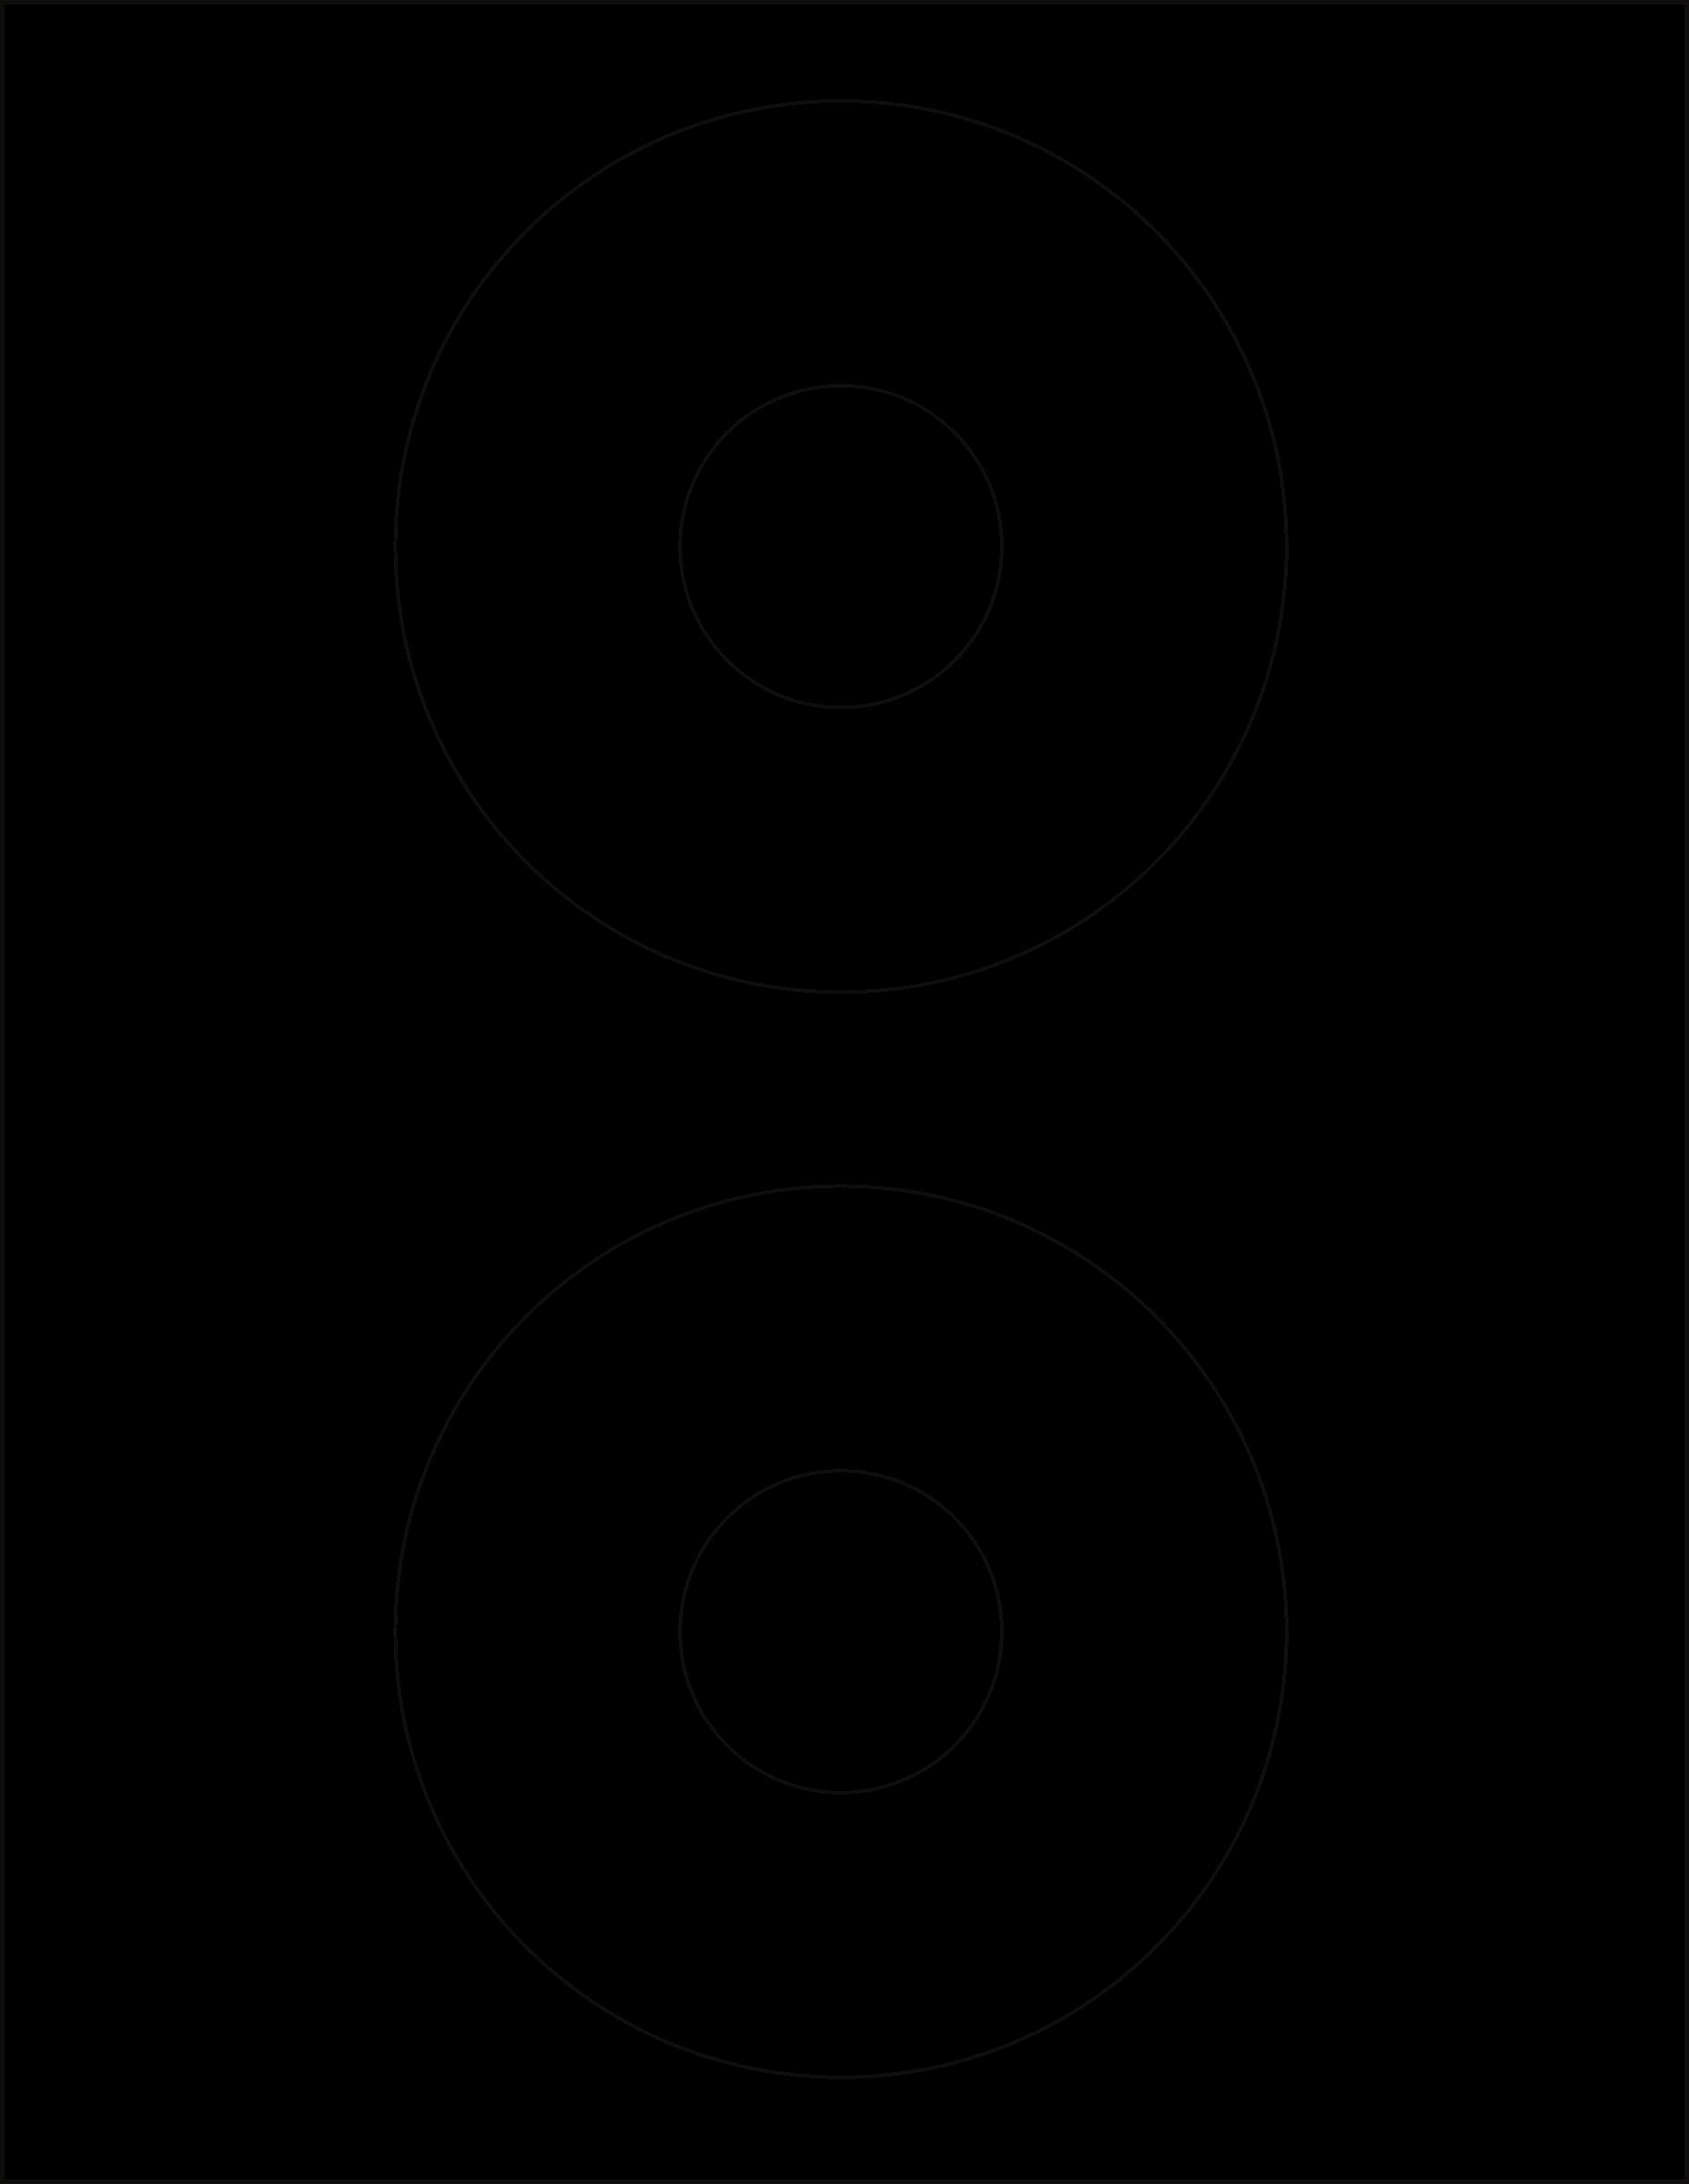 Label clipart template. Wl cd big image